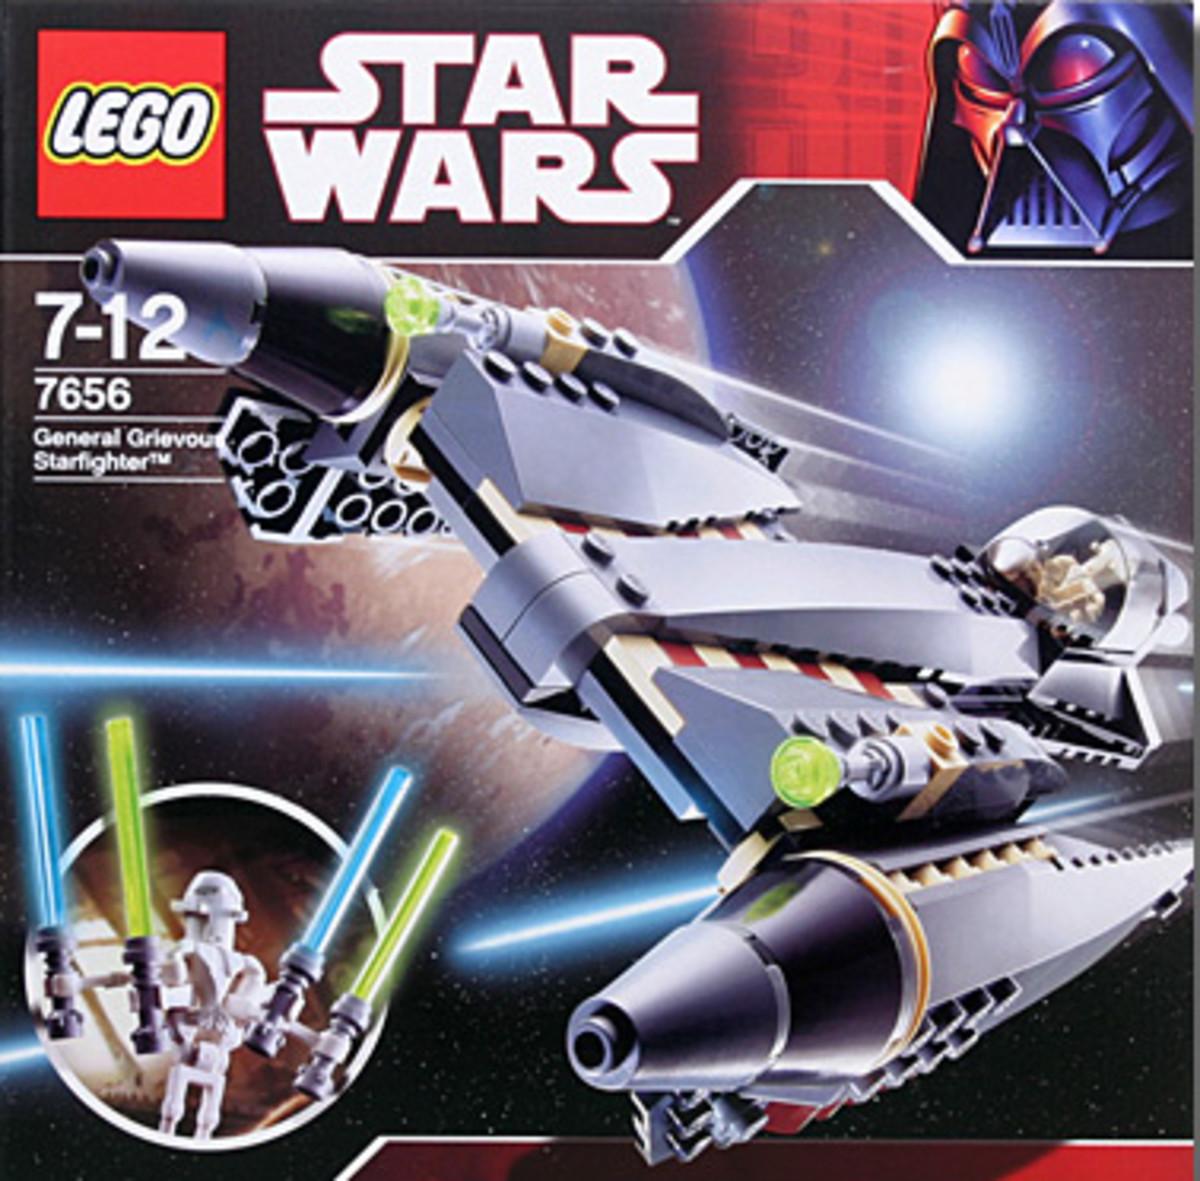 LEGO Star Wars General Grievous Starfighter 7656 Box